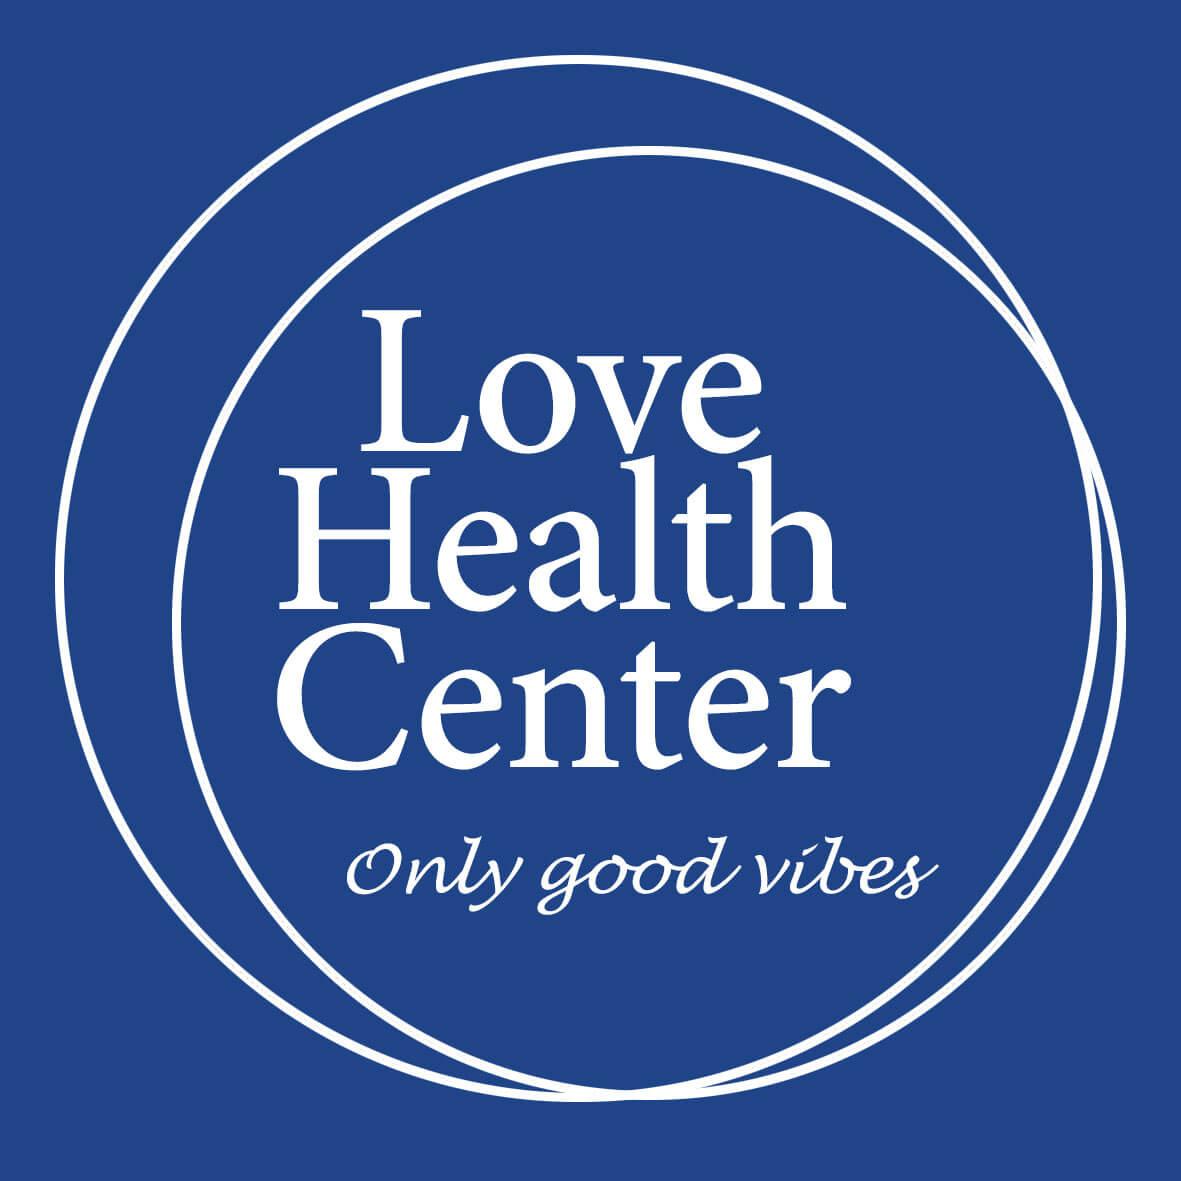 love health center